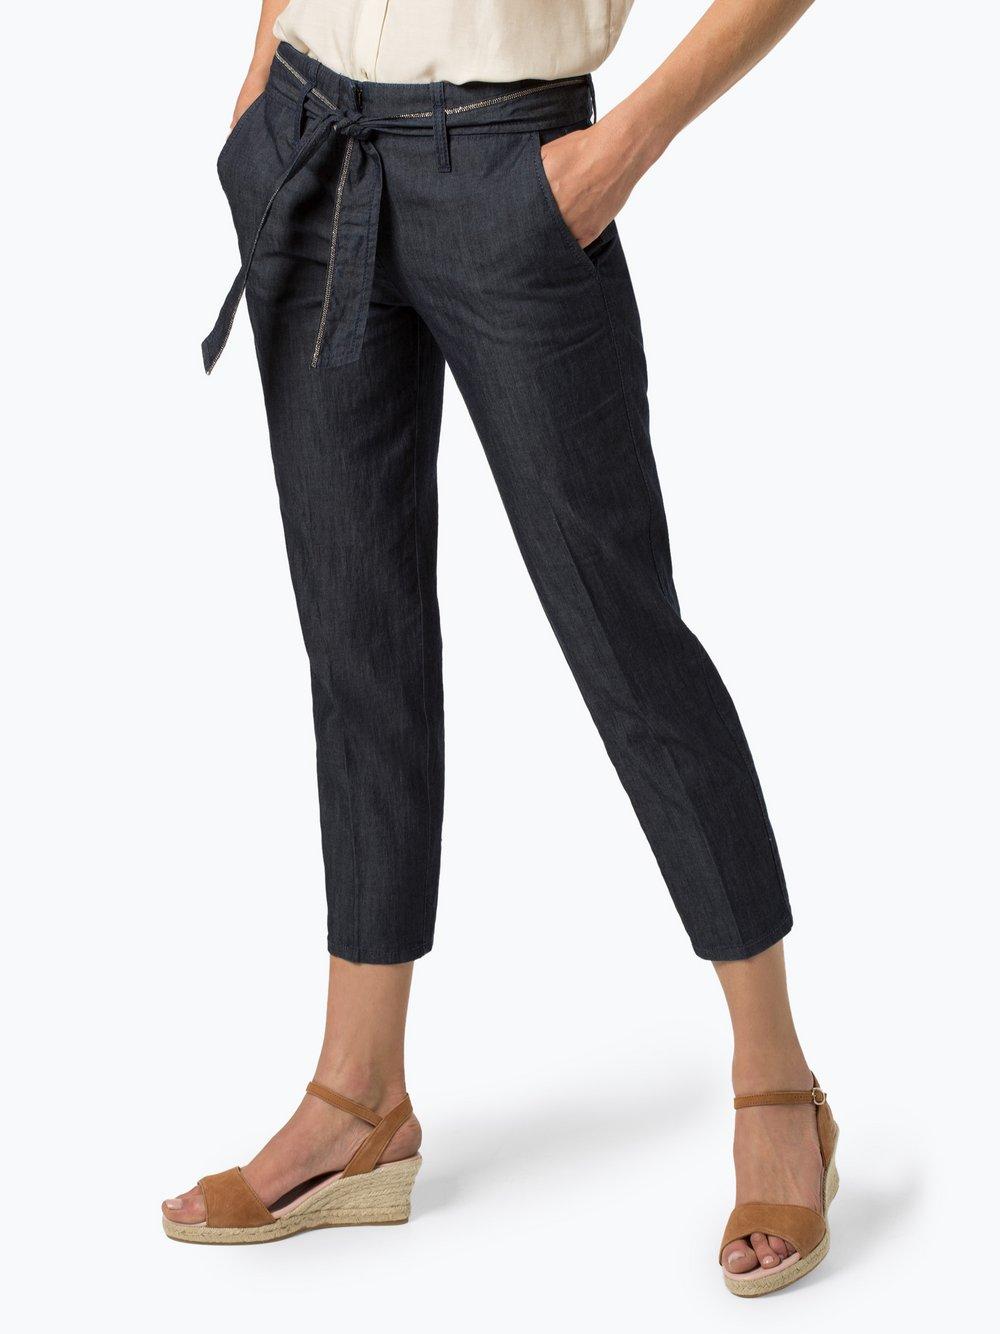 Cambio - Spodnie damskie – Kaia, niebieski Cambio